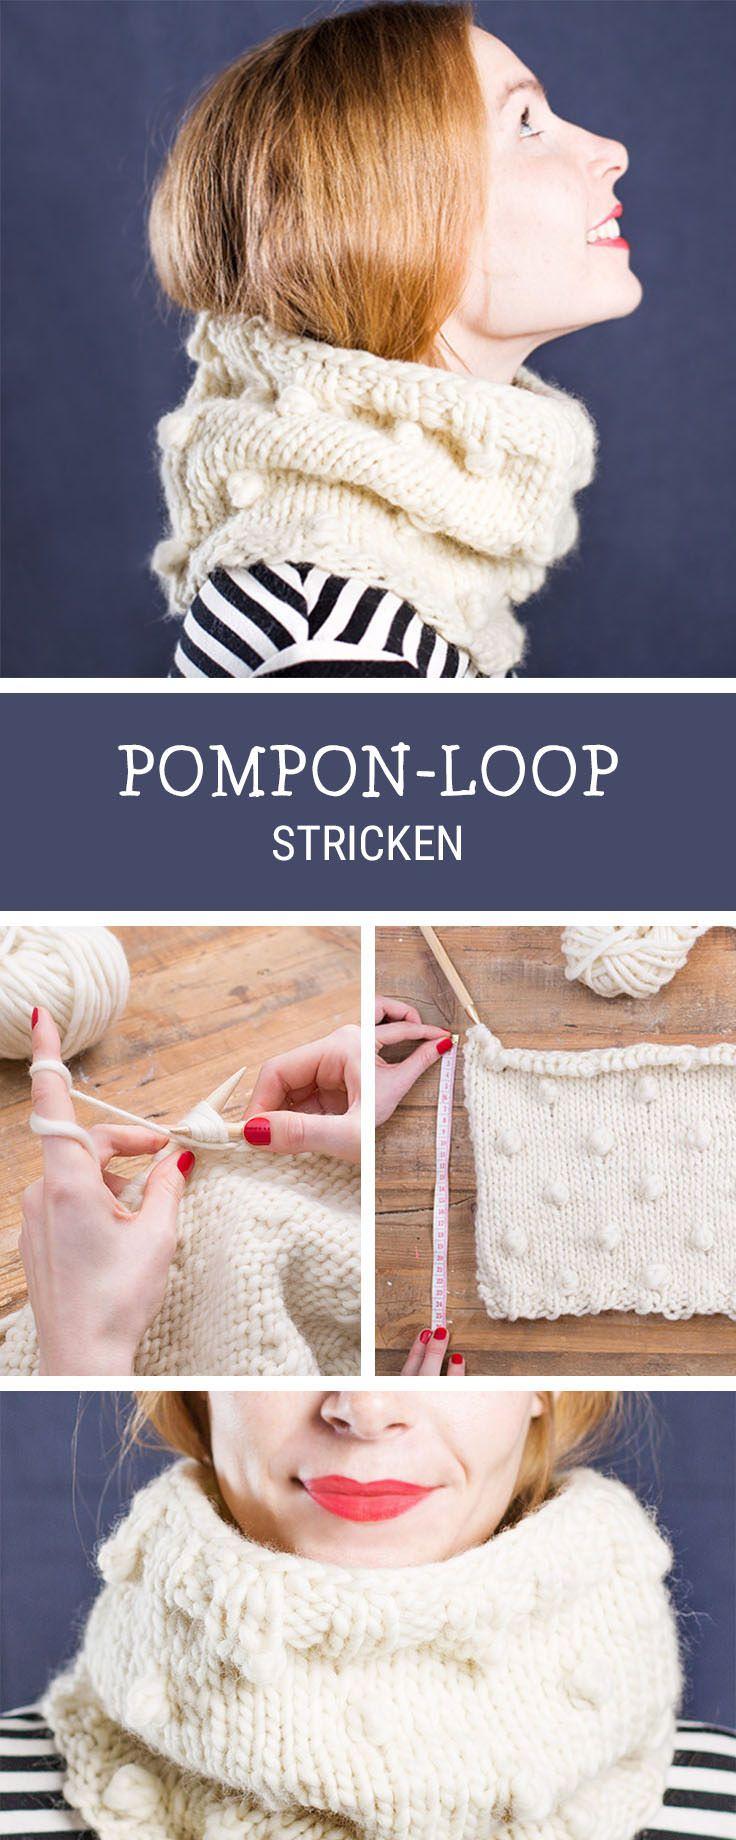 DIY-Anleitung: Loop mit Pompon-Muster stricken via DaWanda.com ...